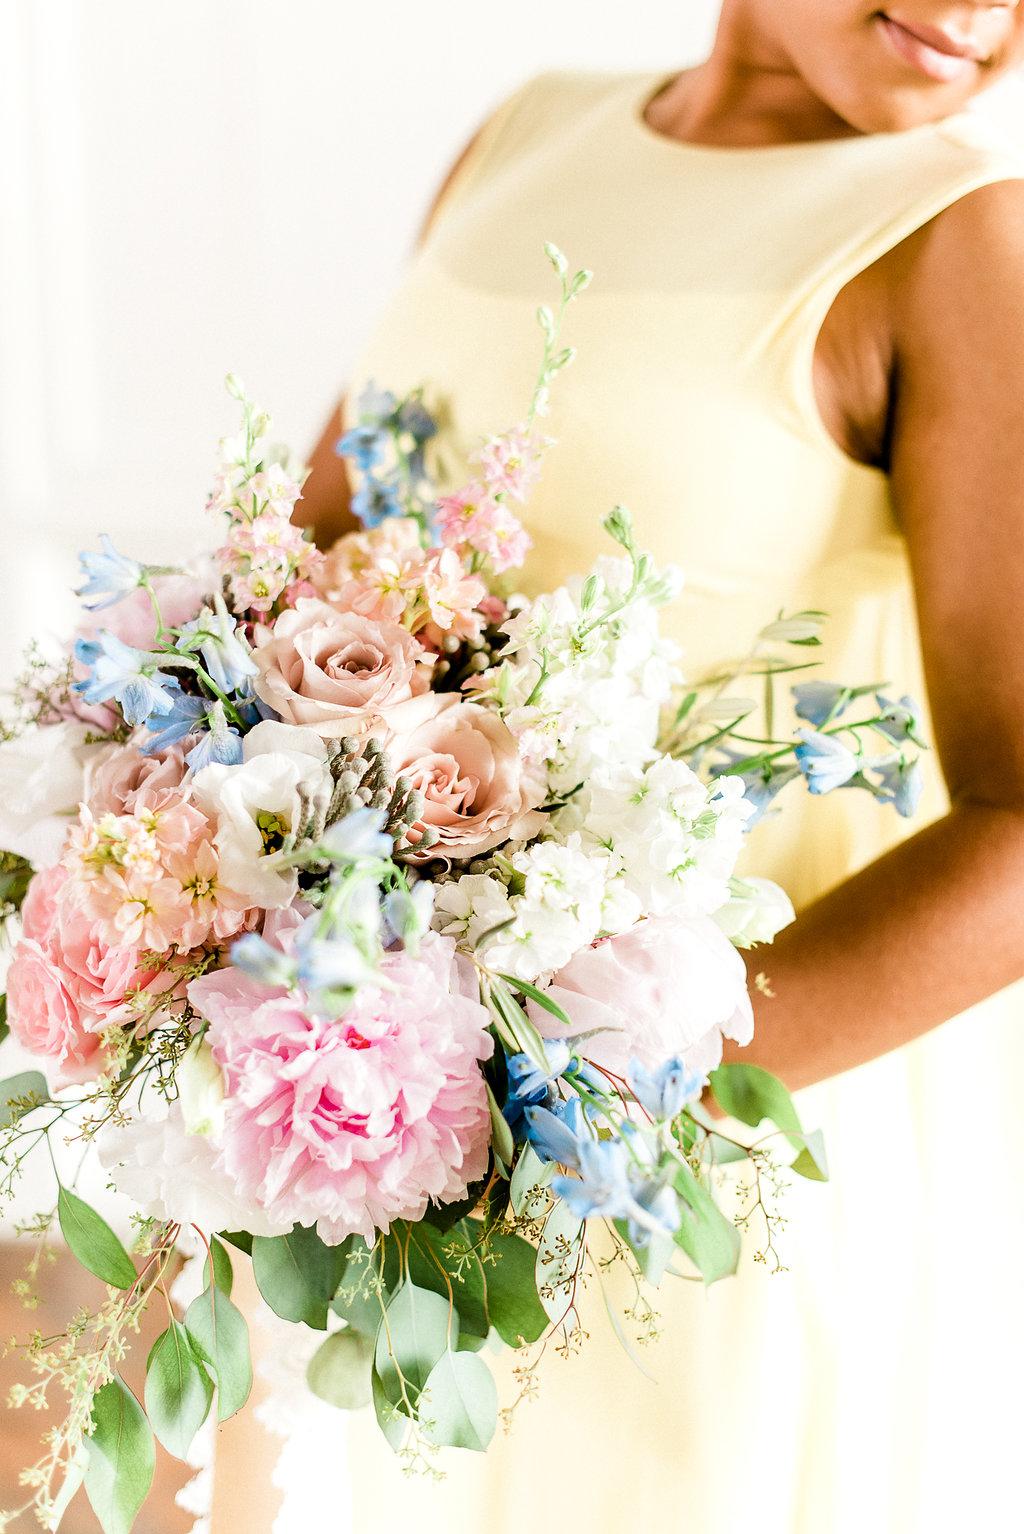 BridalGush_Ohio_Wedding_Photographer_Tonya_Espy-62.jpg